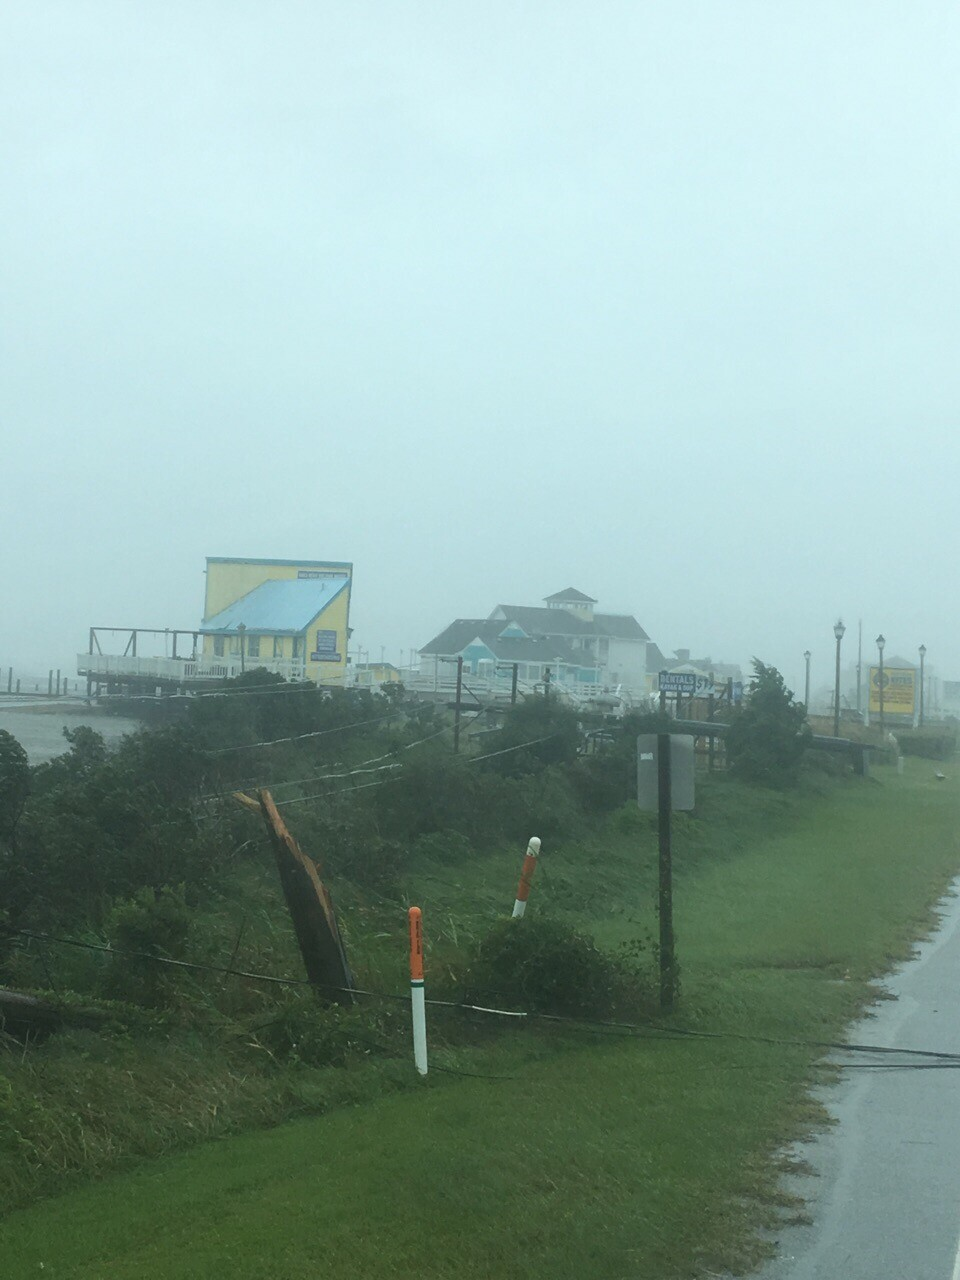 Photos: Dominion Energy crews swiftly restoring power after HurricaneDorian